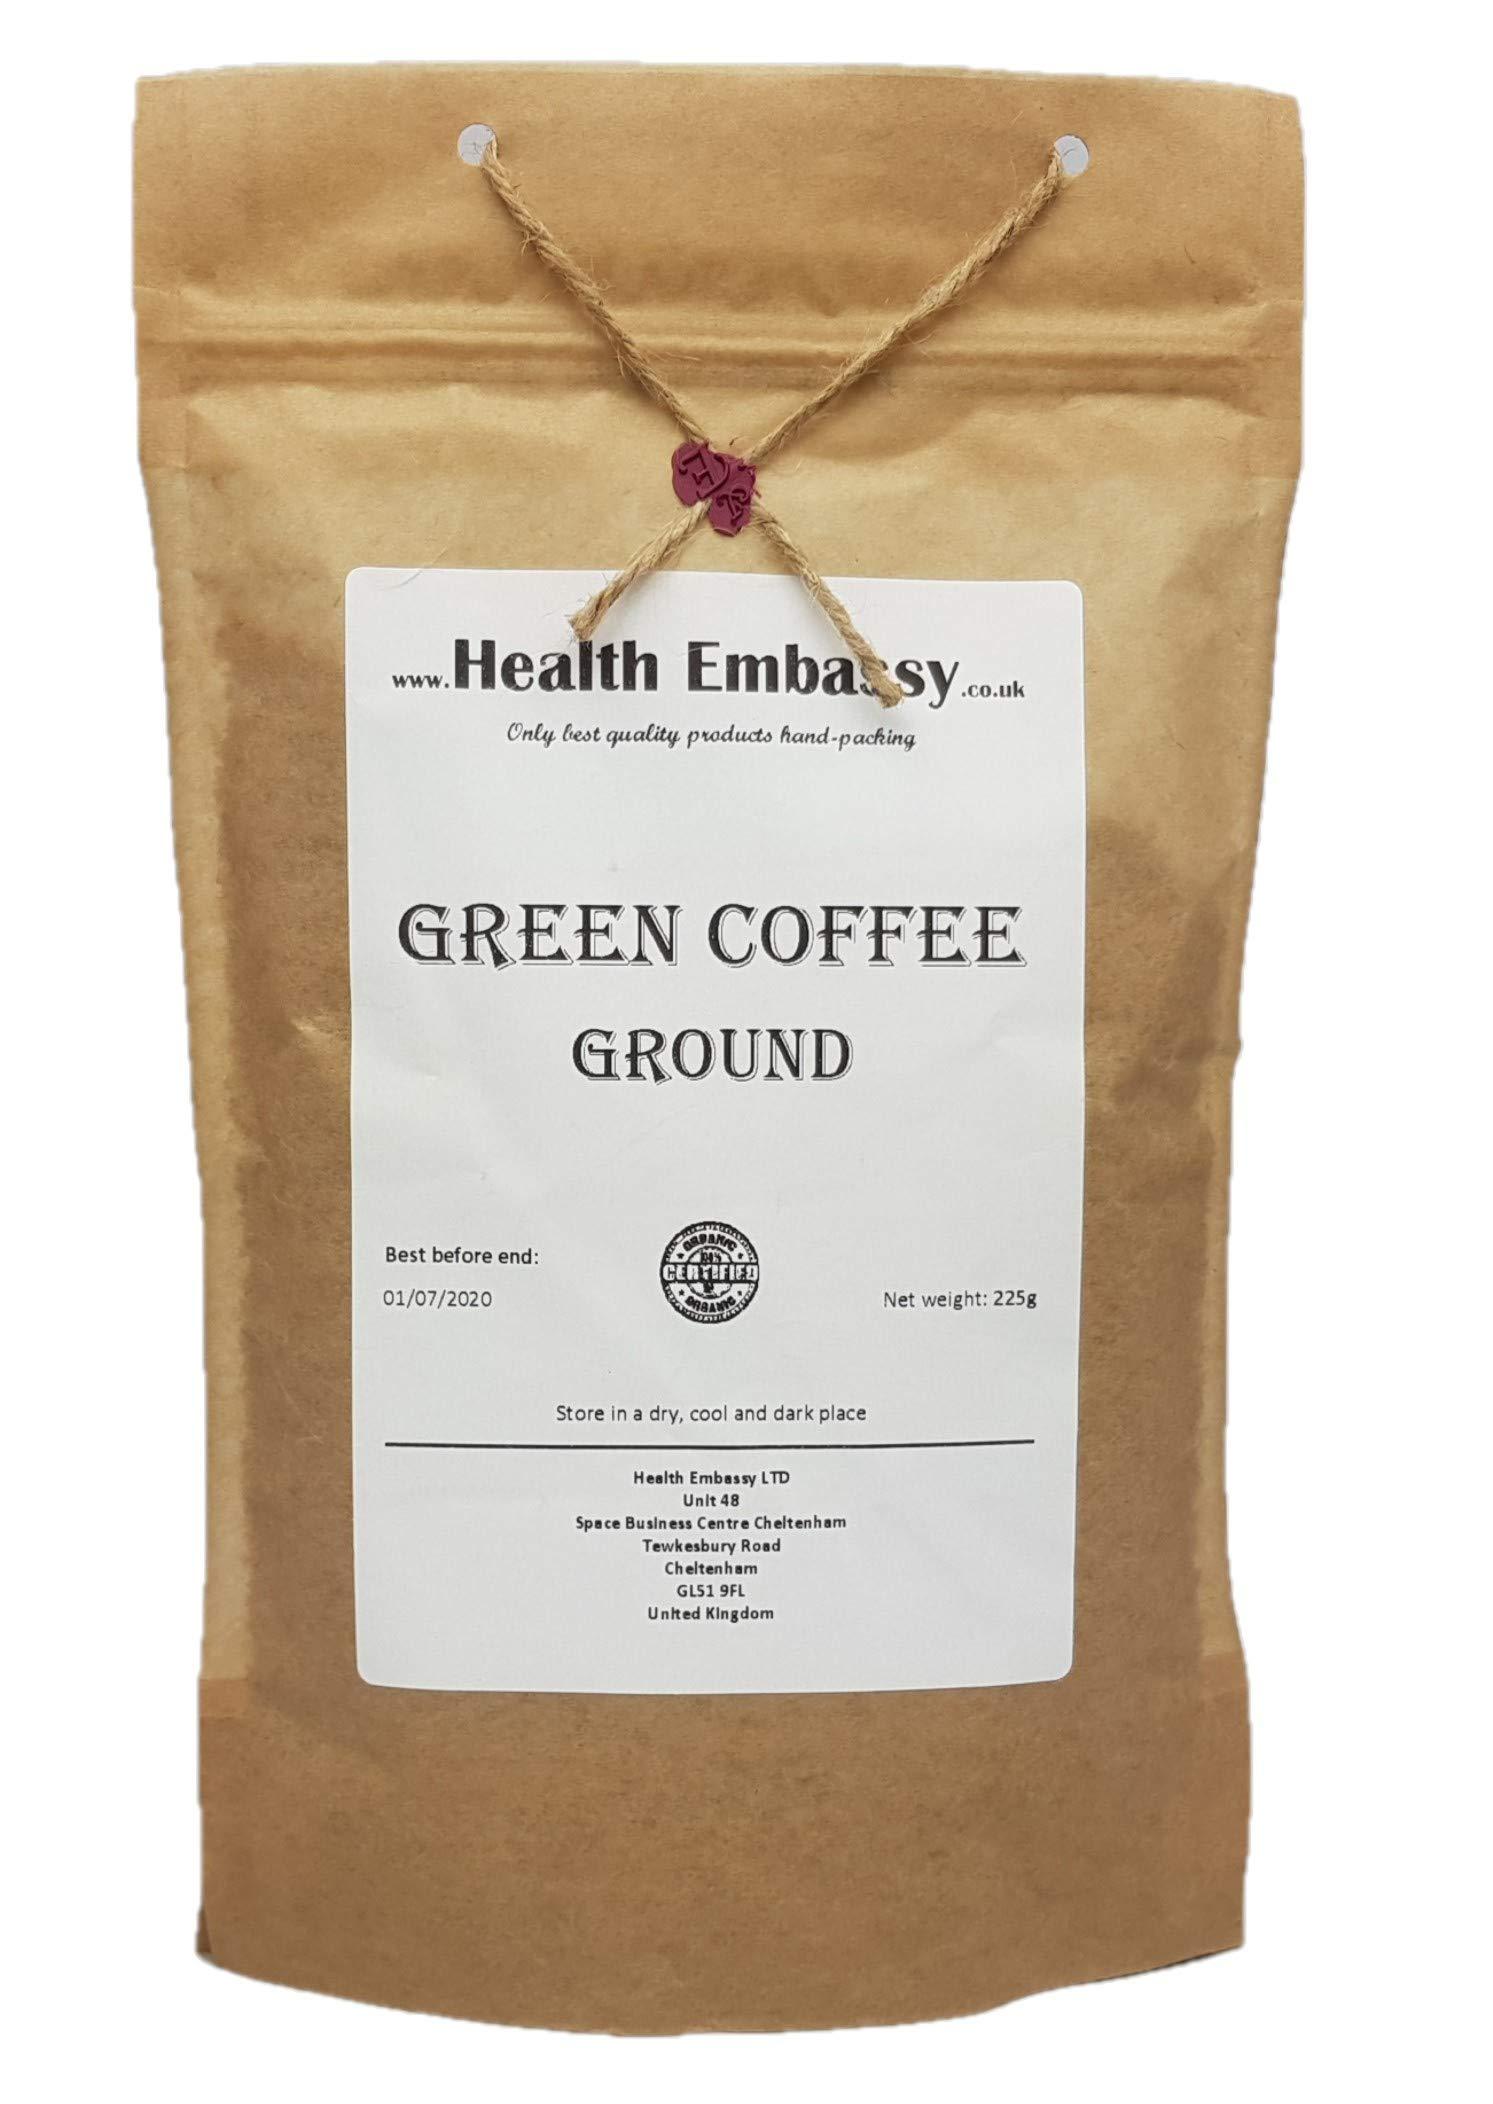 Green Coffee Bean - Ground - Health Embassy - 100% Natural (225g)